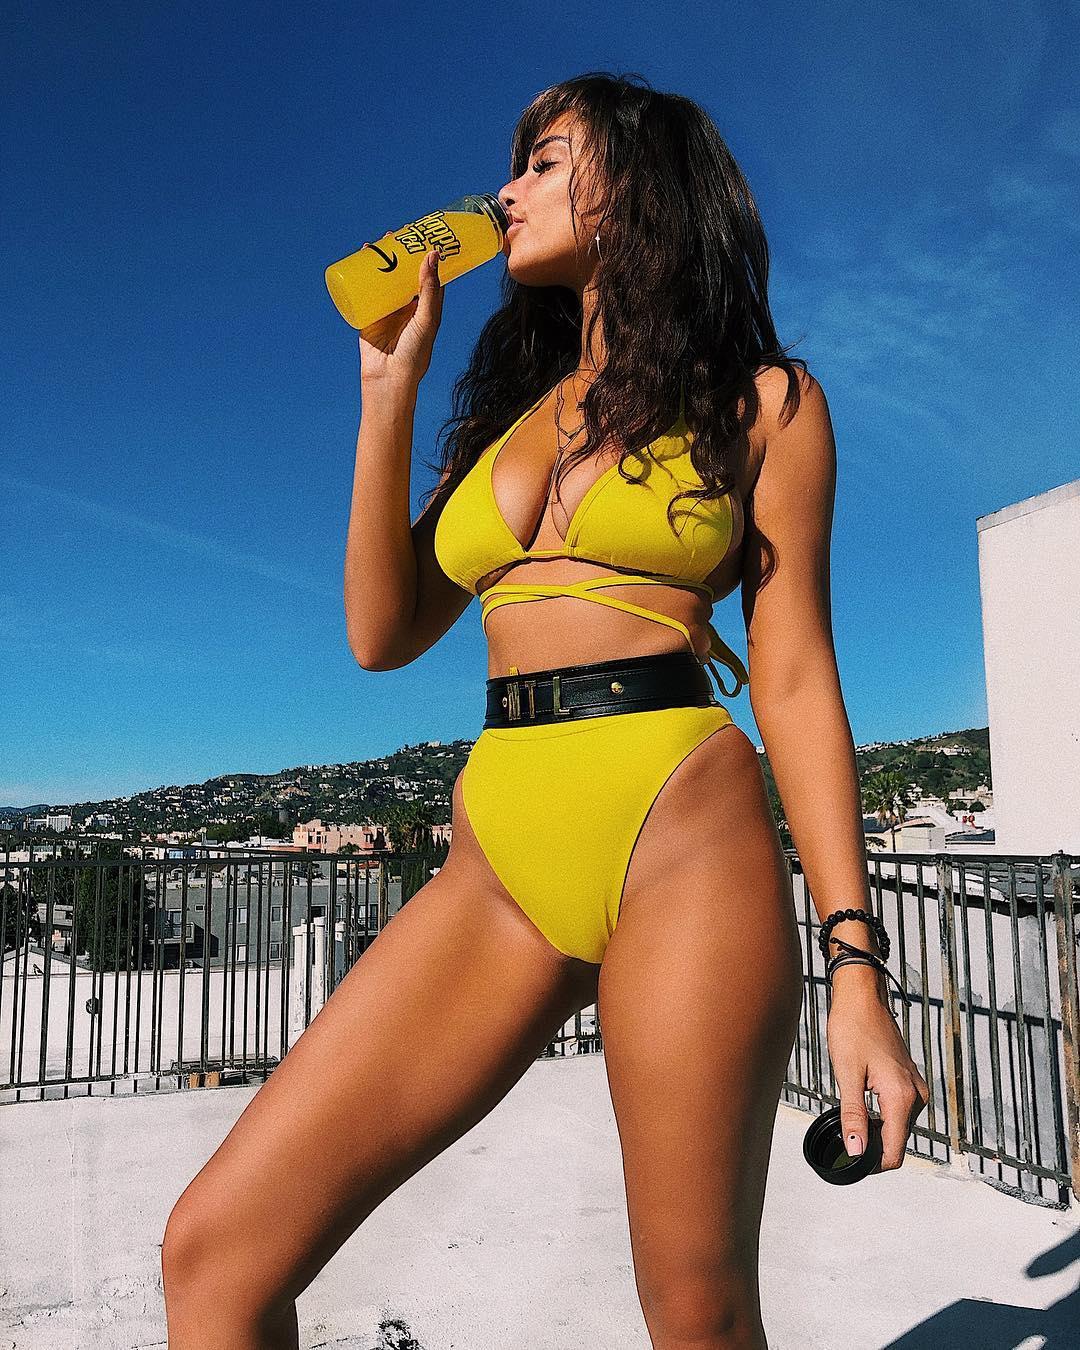 Tori Green Nude Photos Leaked!0015